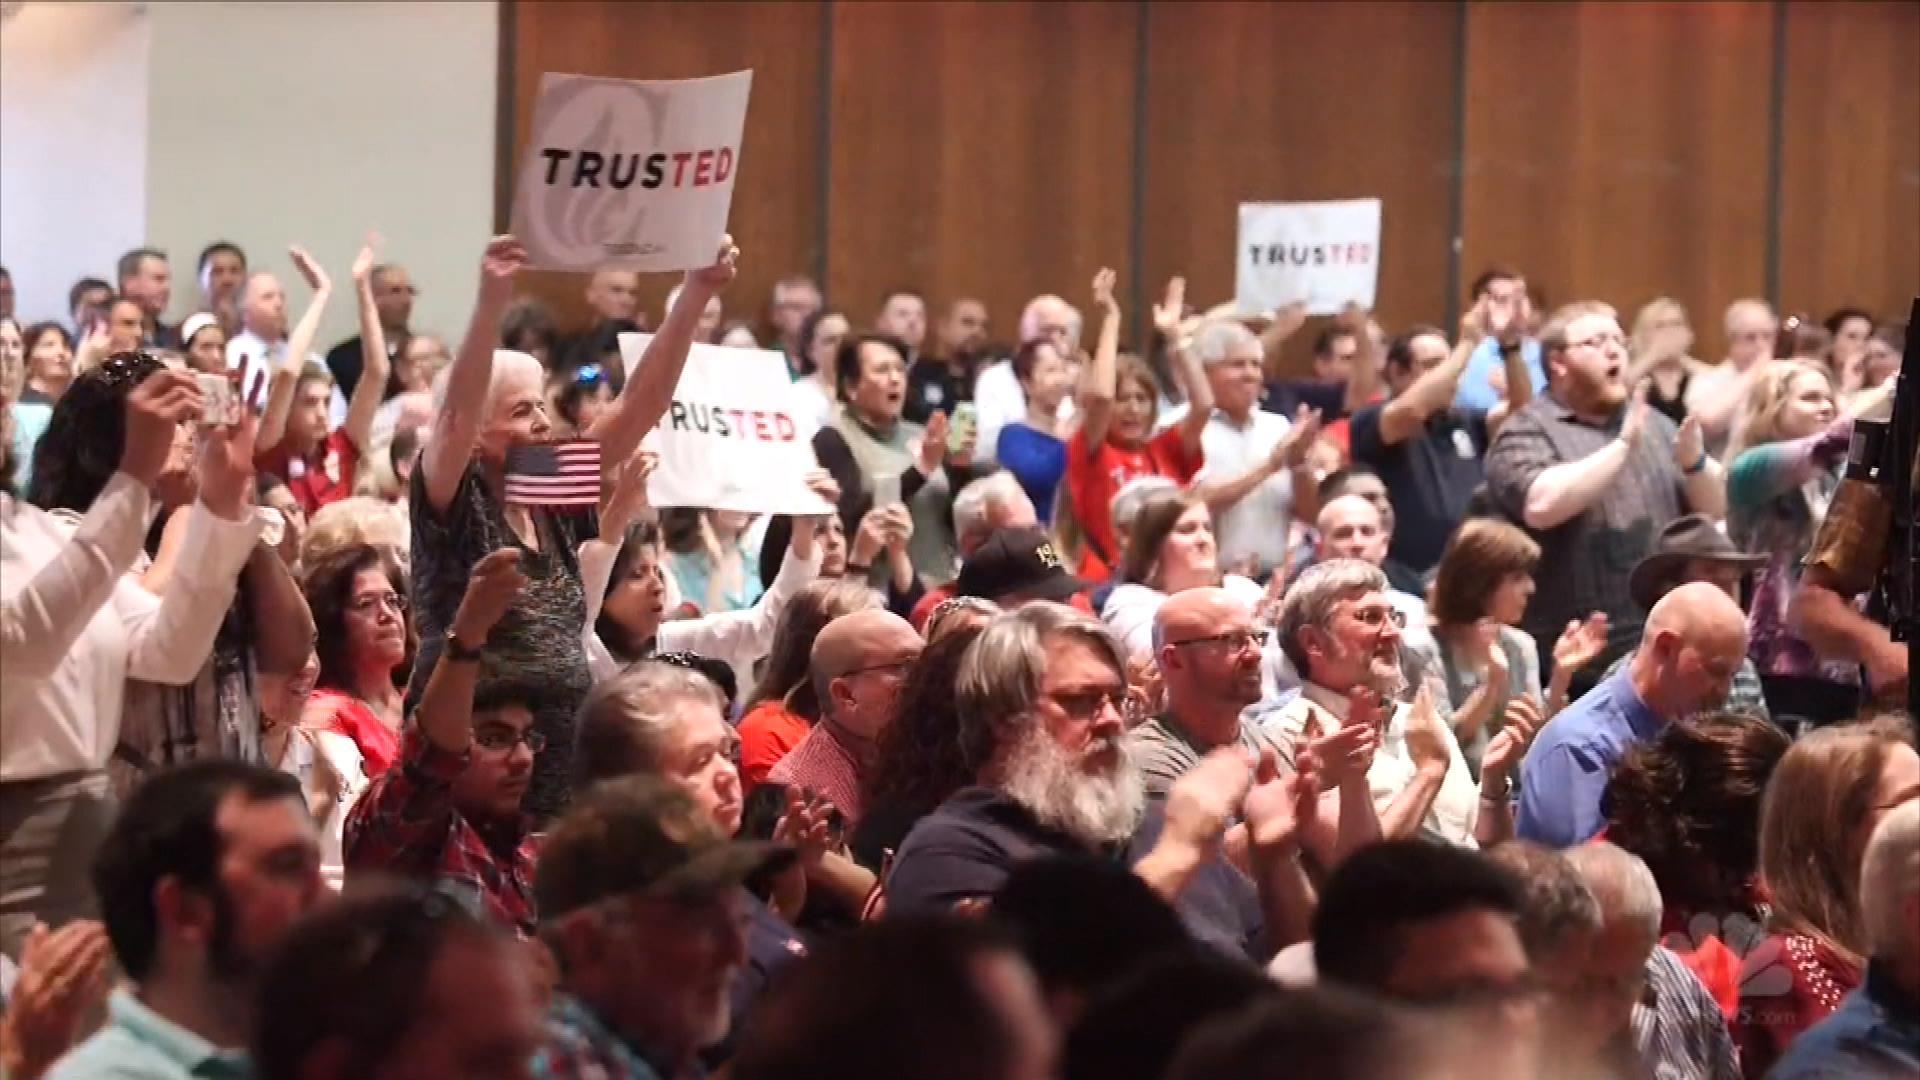 Last Stand for Cruz?